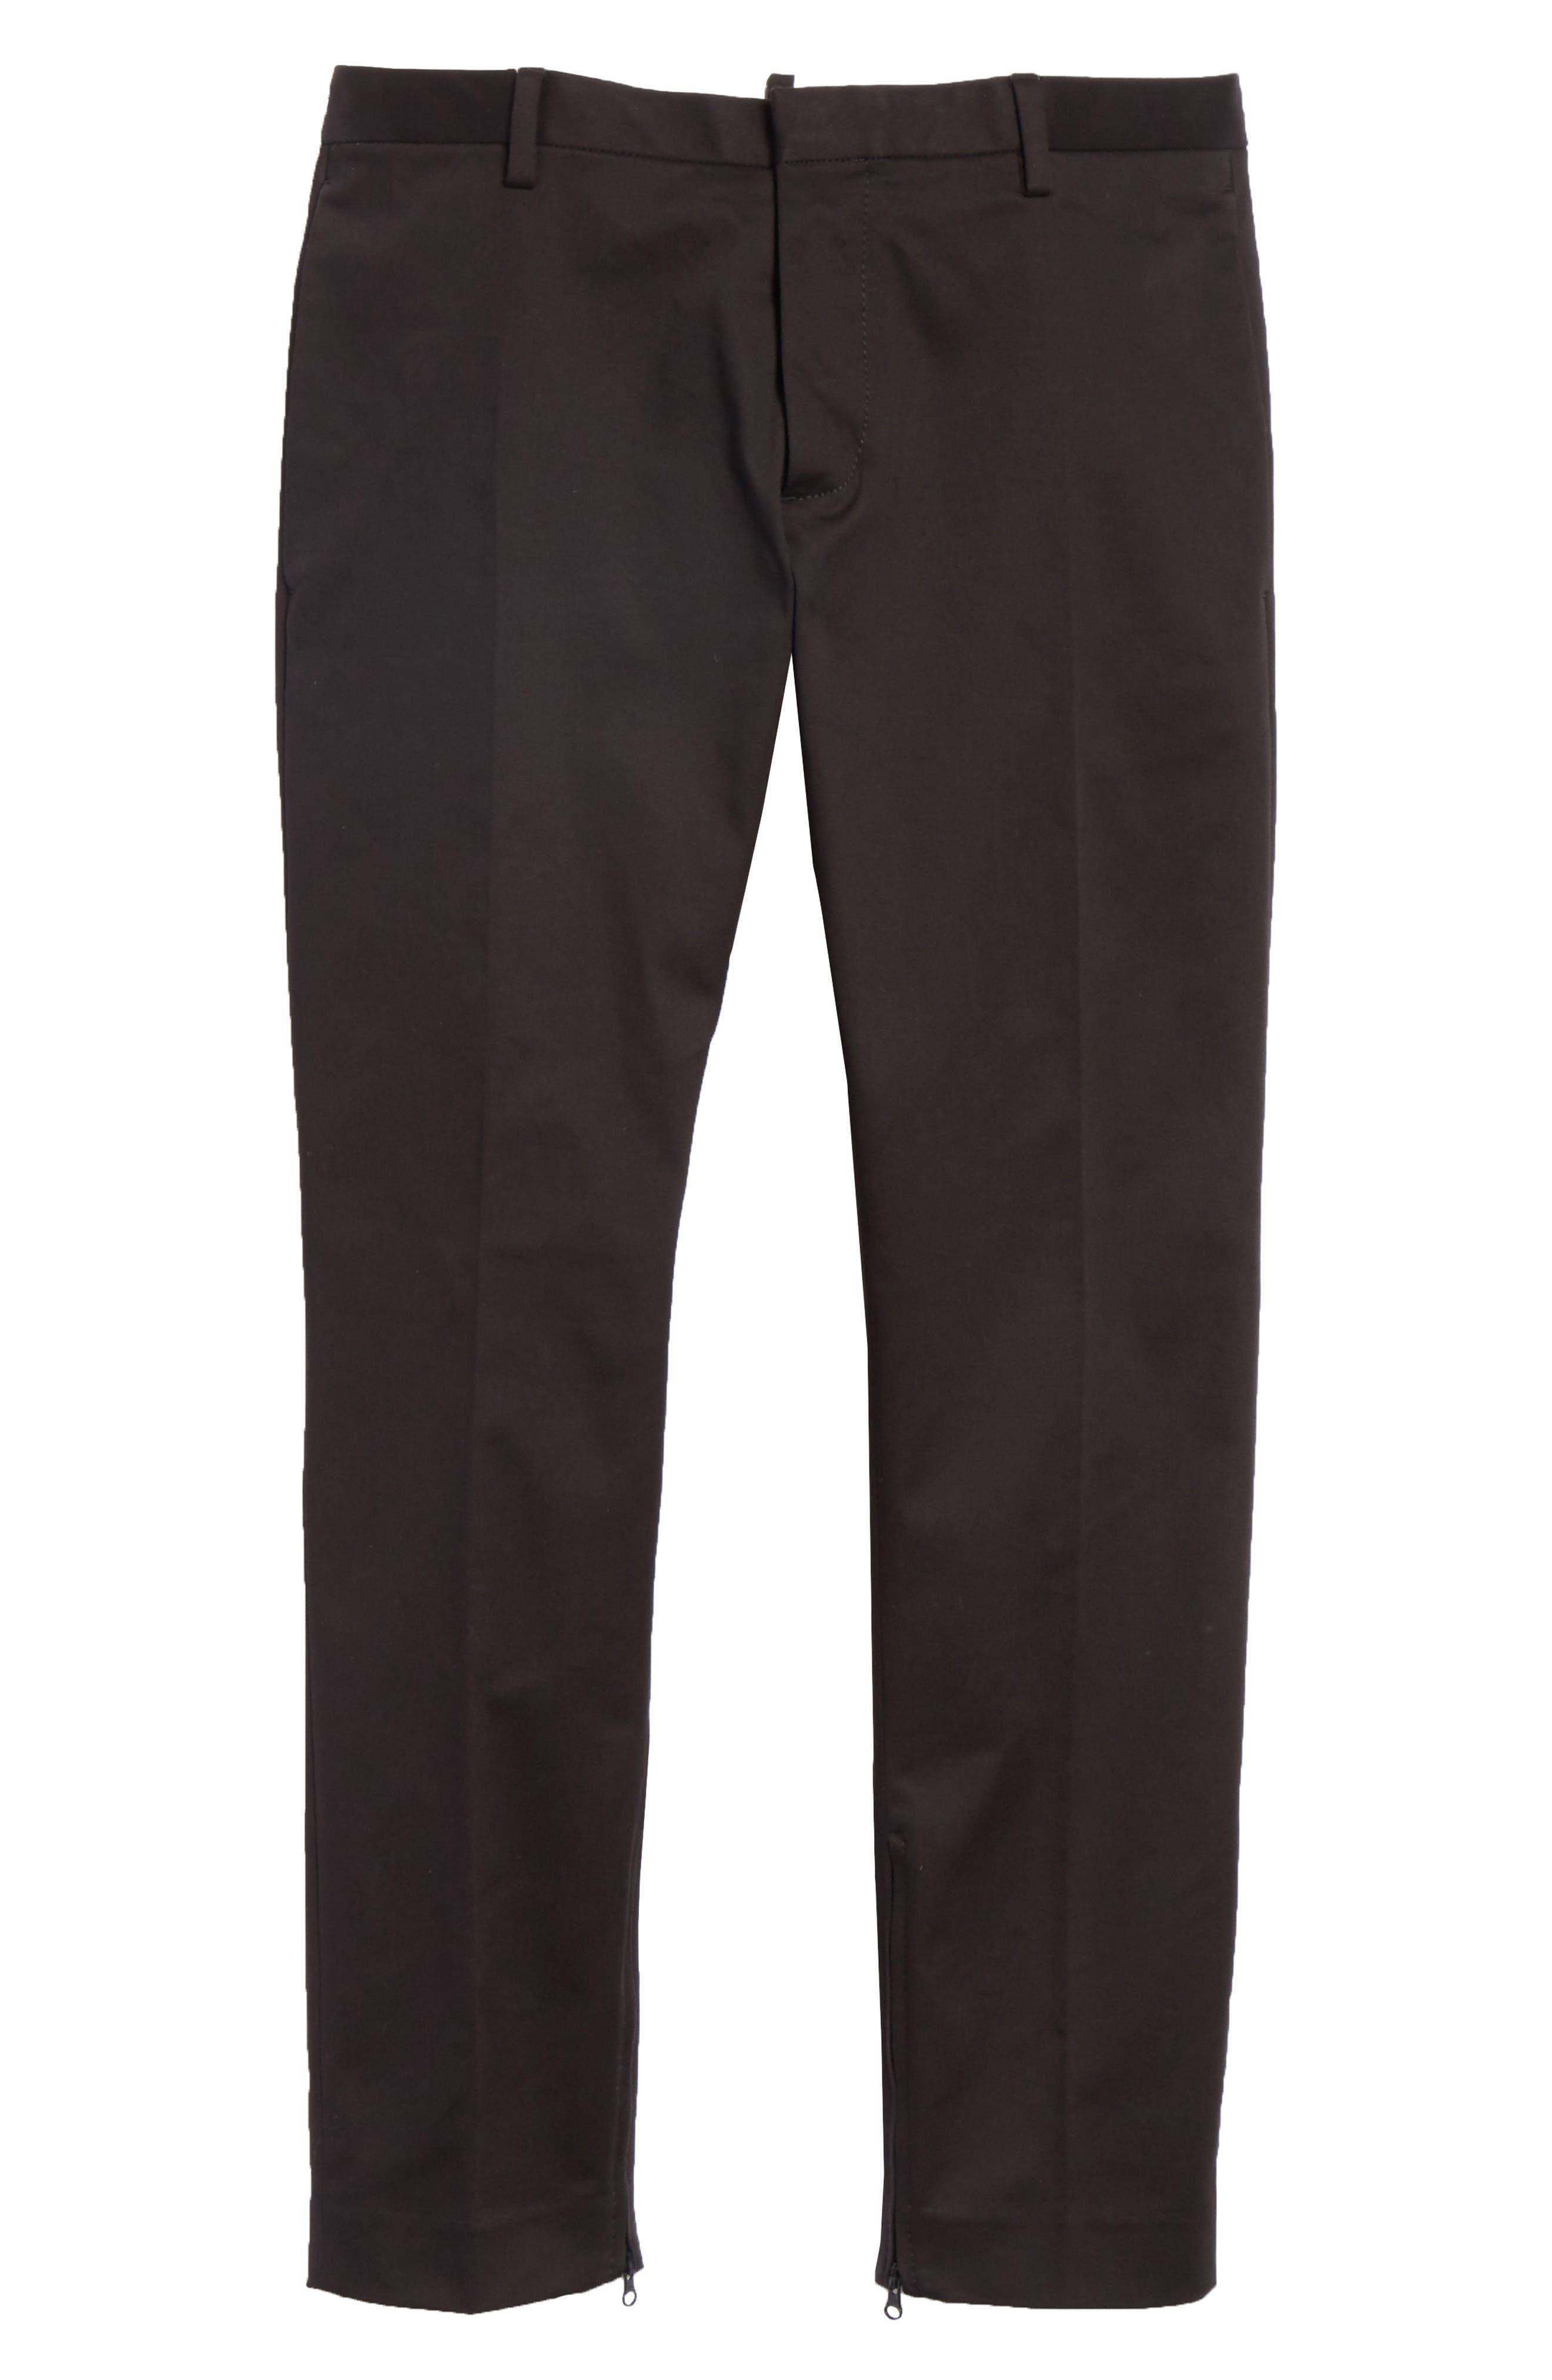 Dan Skinny Fit Cropped Trousers,                             Alternate thumbnail 6, color,                             Black